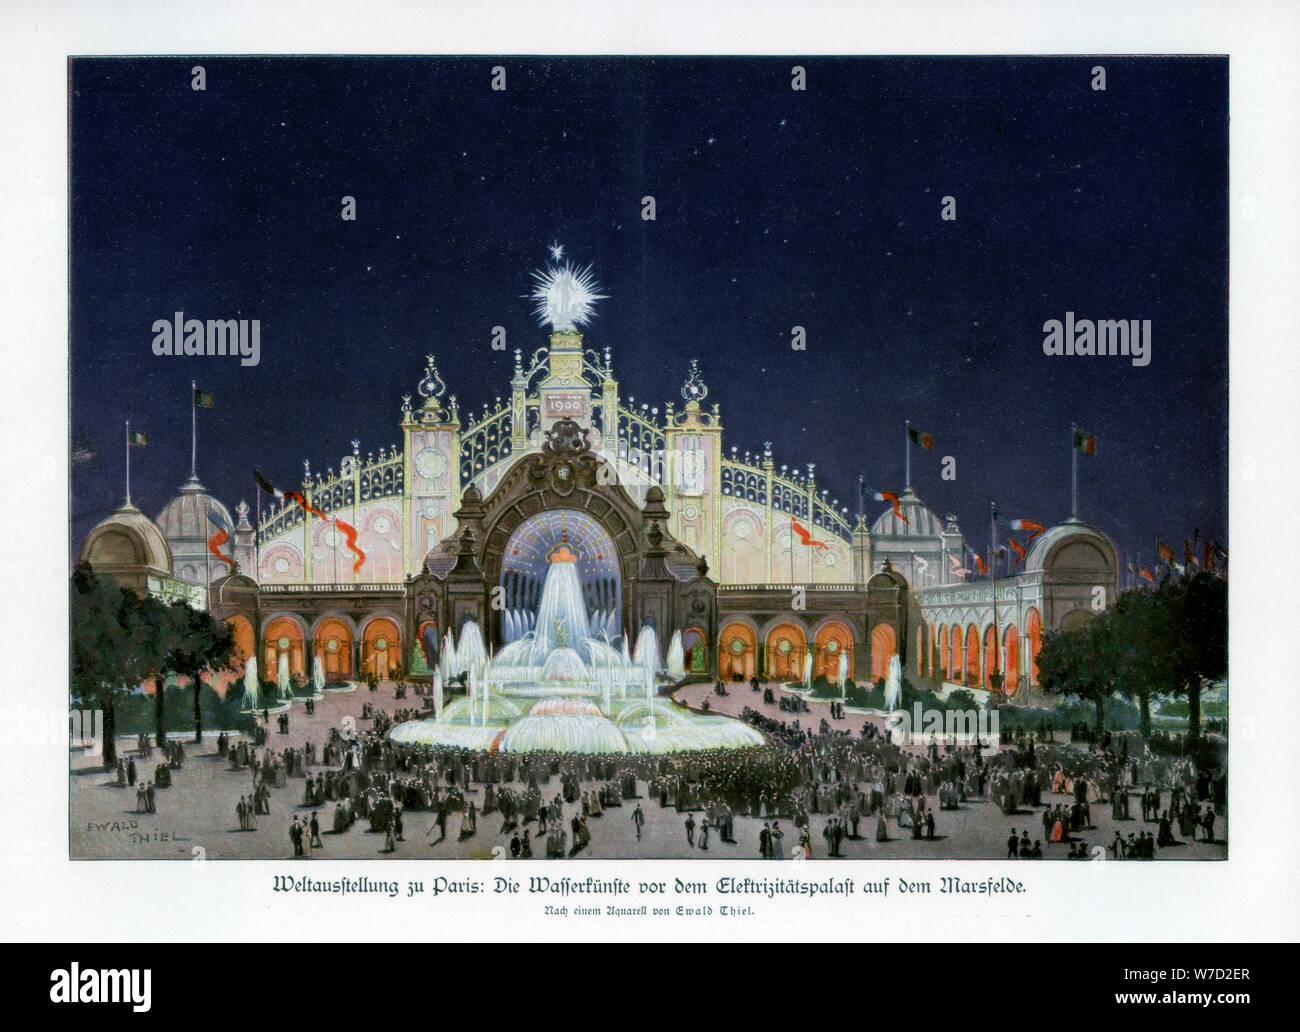 Fountains at the Palace of Electricity, Champ de Mars, Paris World Exposition 1889, (1900).Artist: Ewald Thiel Stock Photo